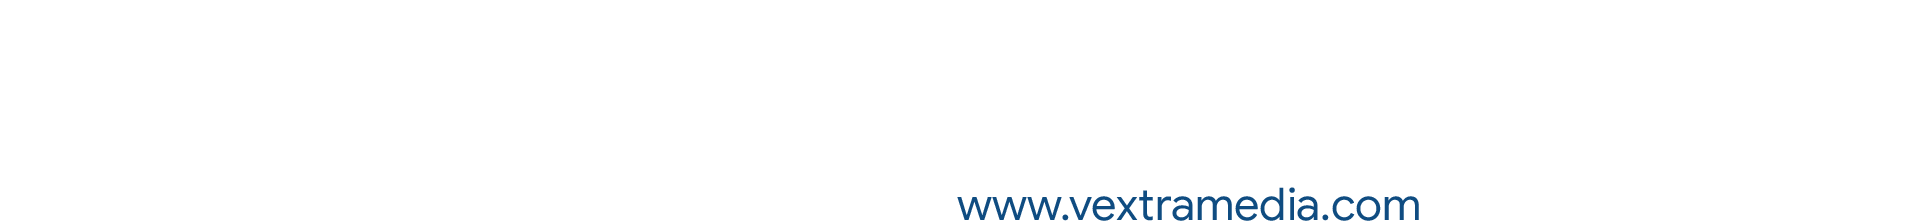 cabecera-inicio-vextramedia-